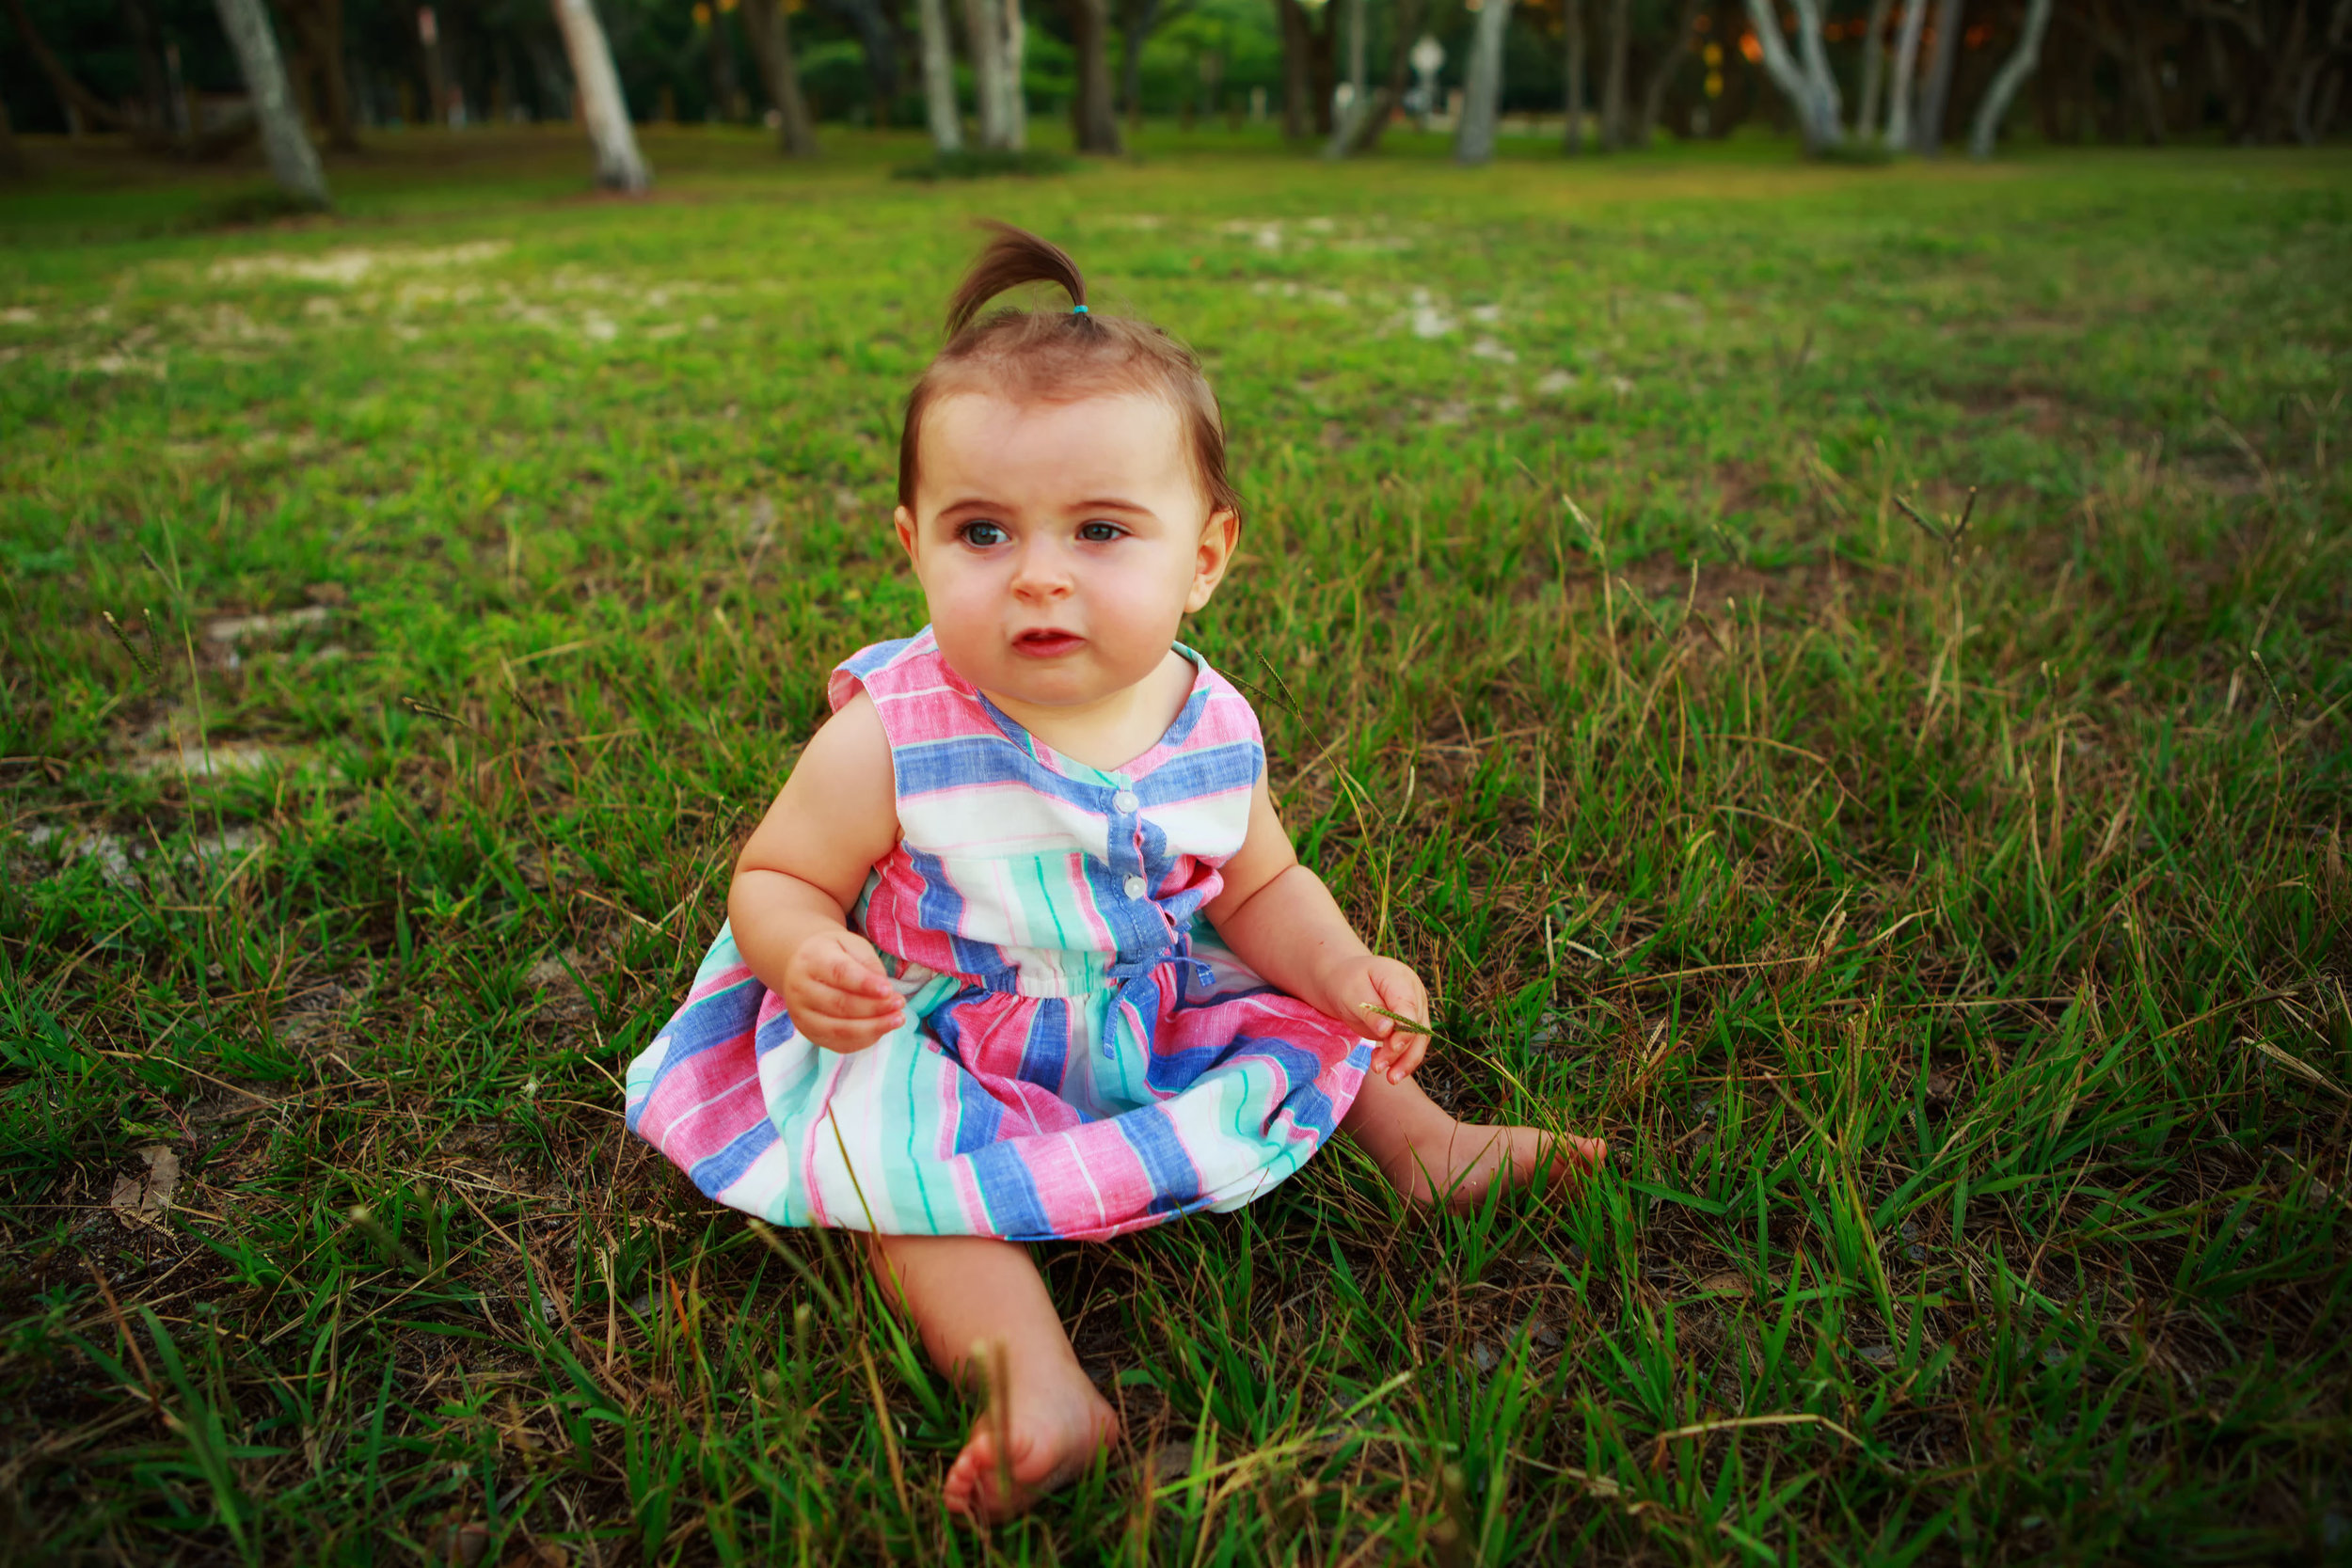 NC_Photographer_Ft_Fisher_Family_Photos_Tiffany_Abruzzo_28.jpg